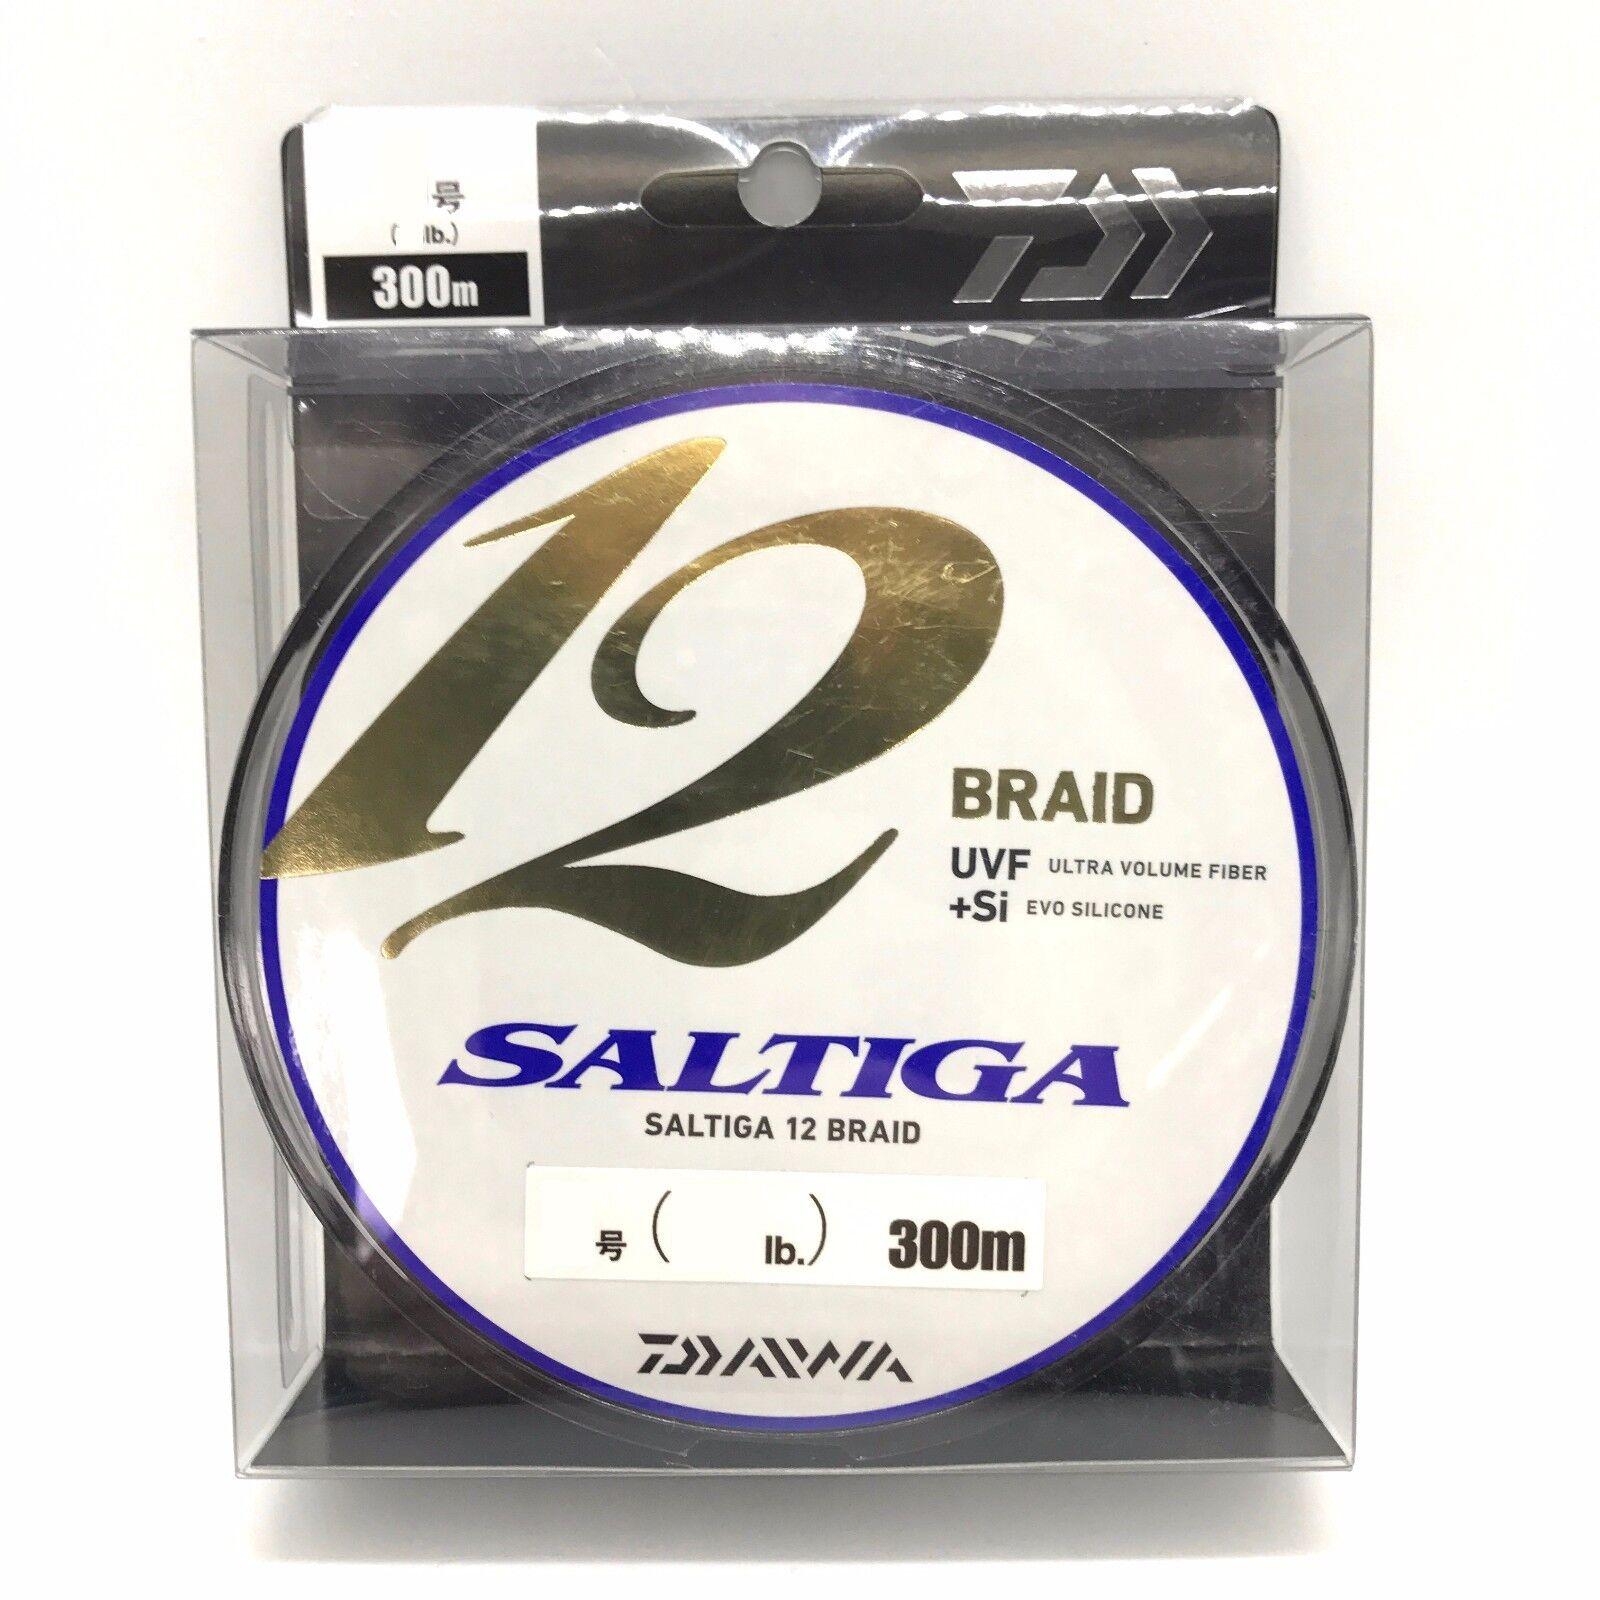 daiwa saltiga 12 braid review